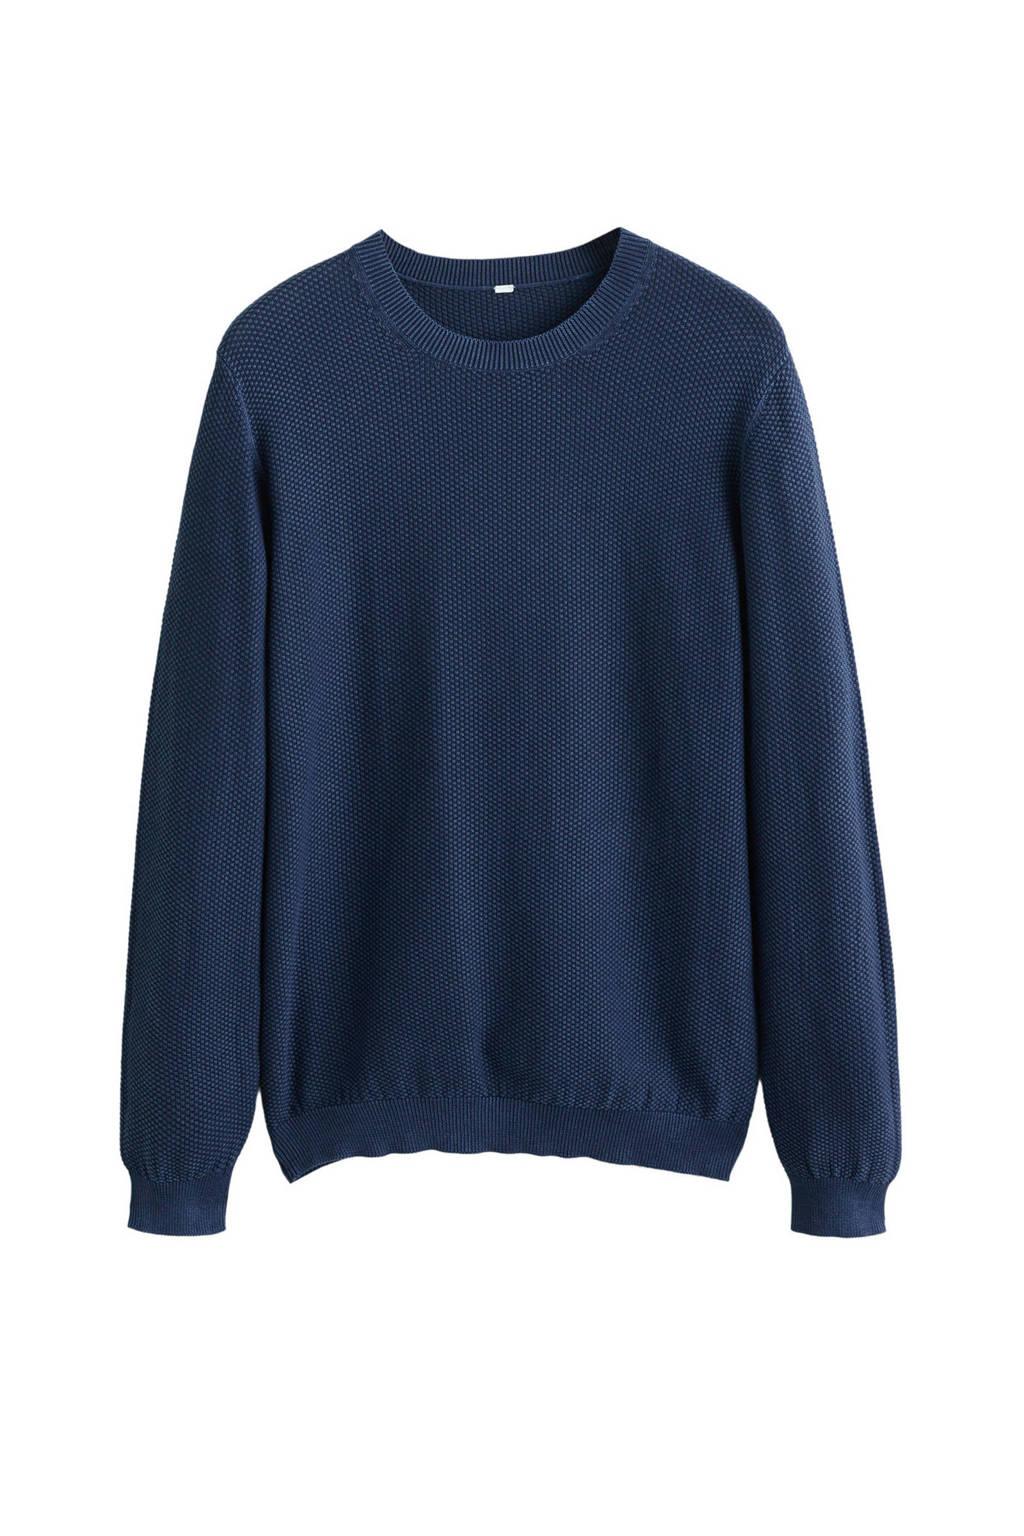 Mango Man trui met textuur donkerblauw, Donkerblauw